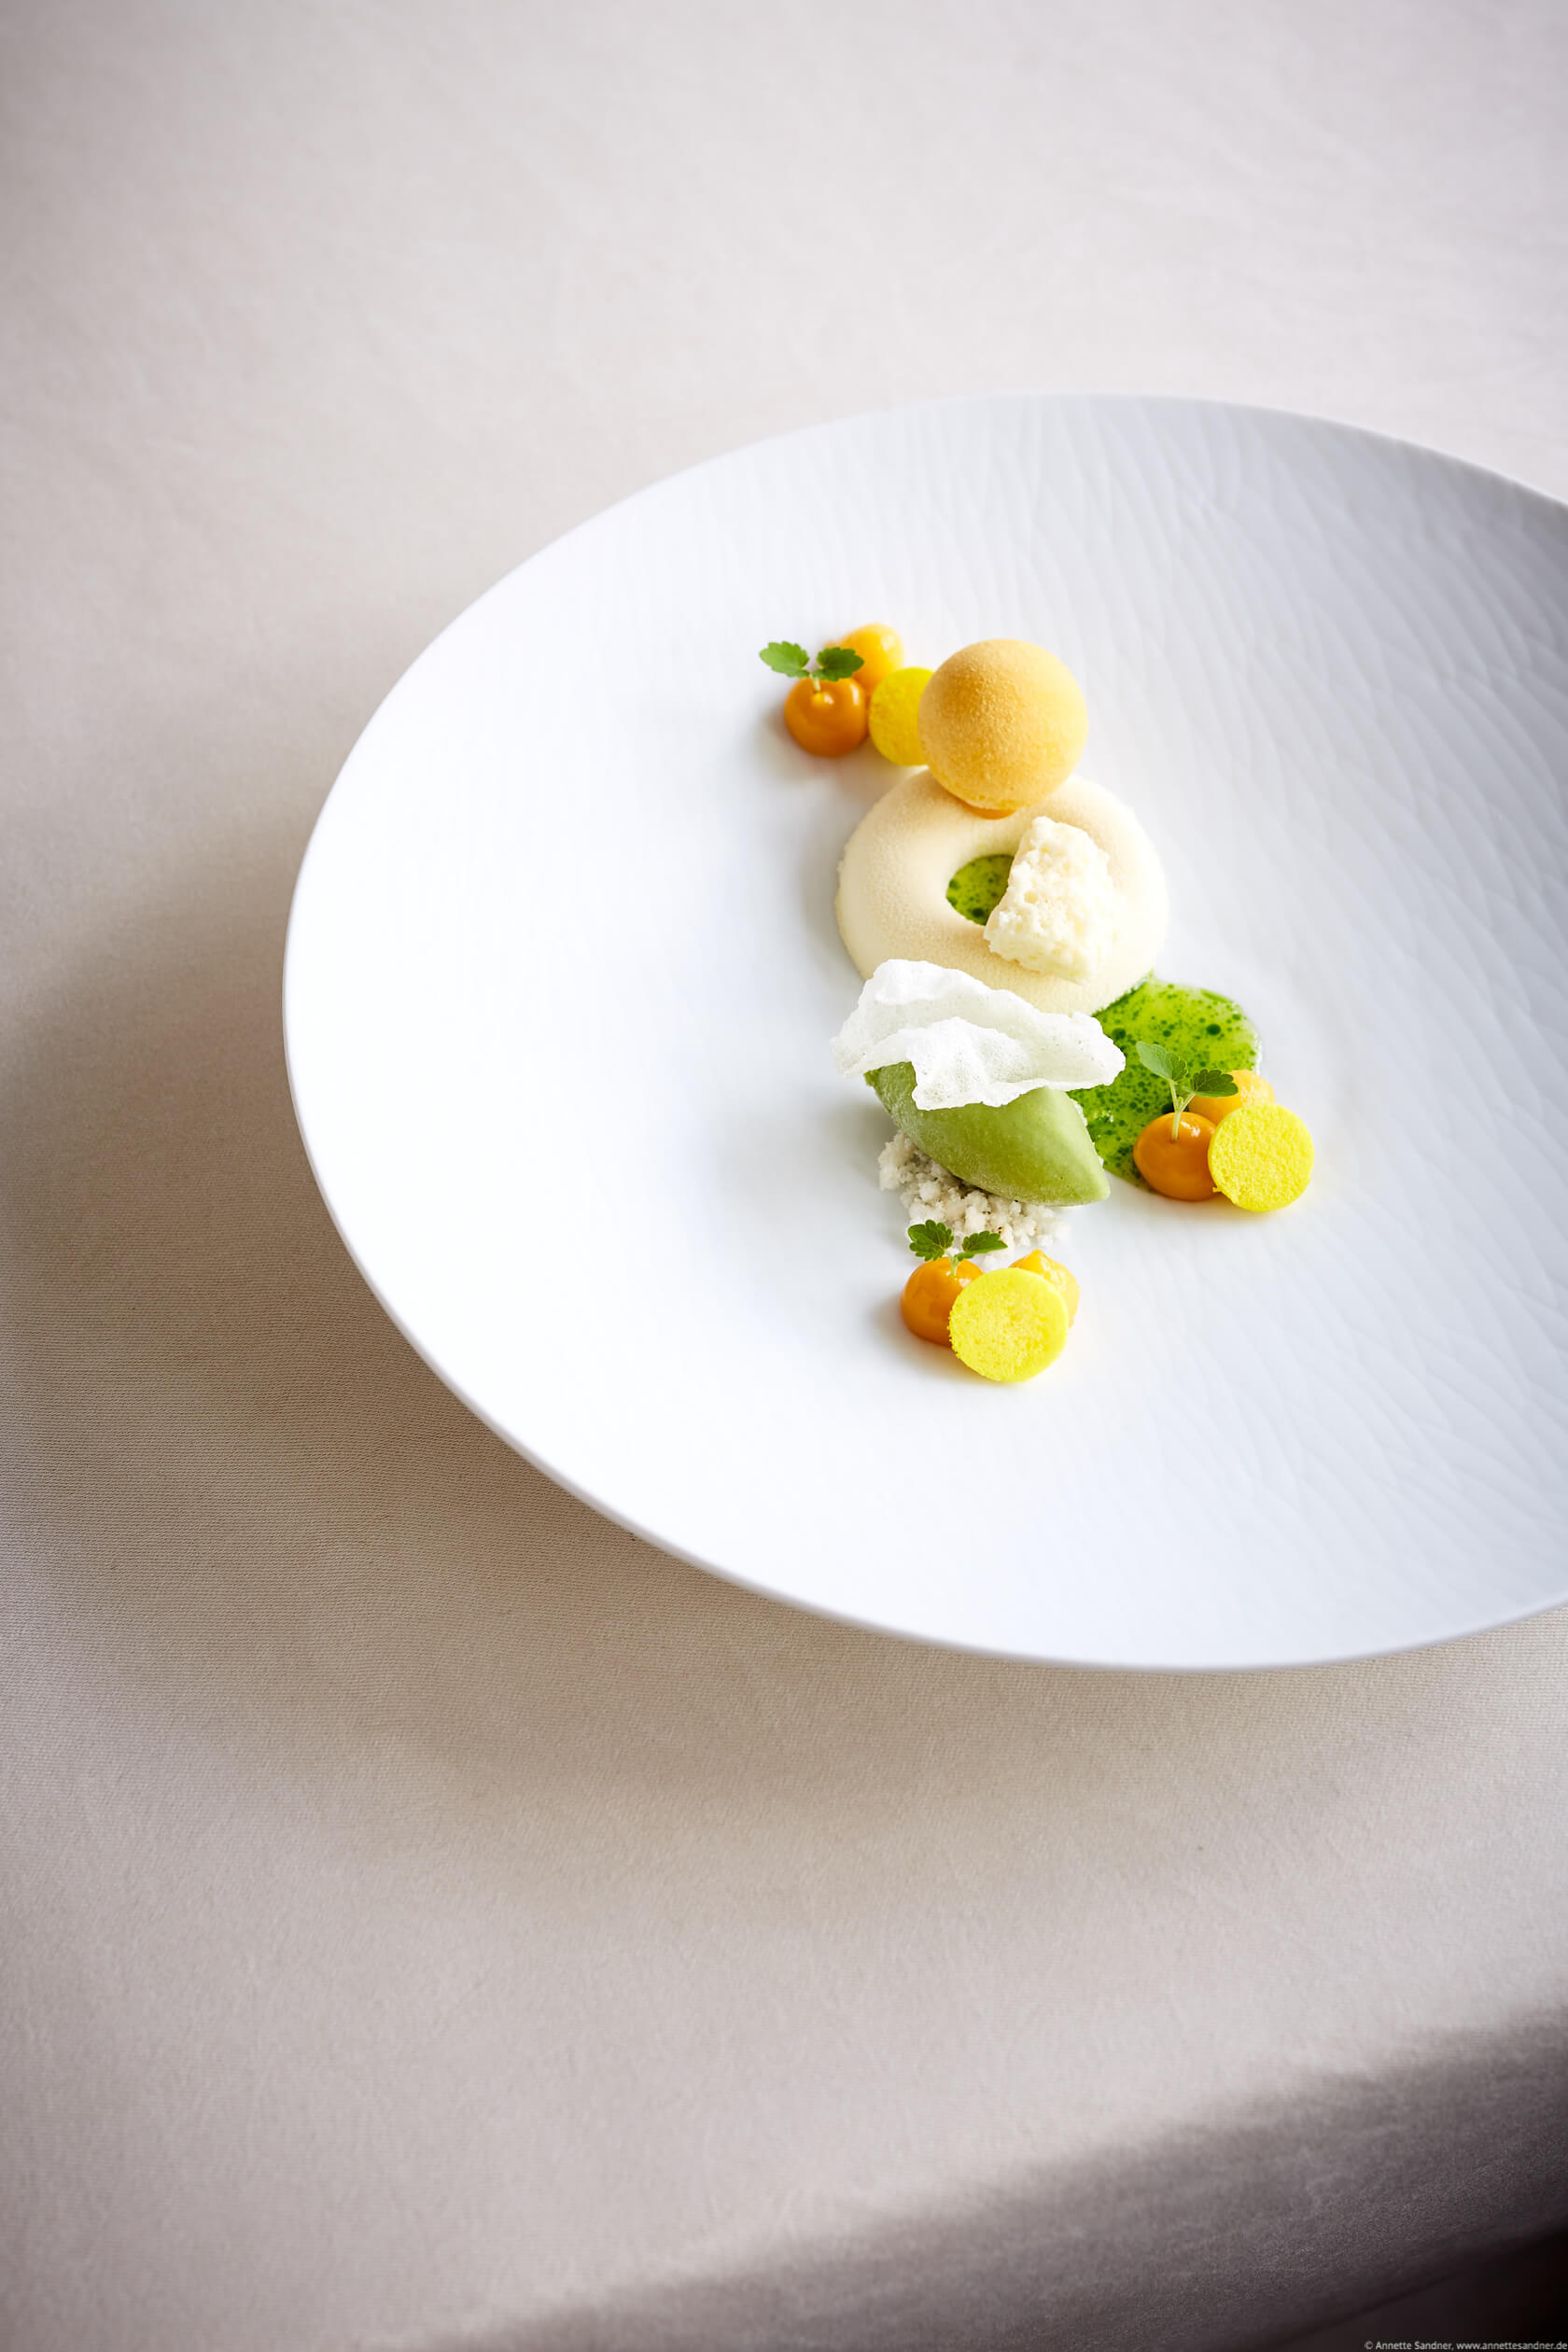 Felchlin Schokolade Mango, Thaibasilikum, Gourmet Restaurant Olivo, Anton Gschwendtner